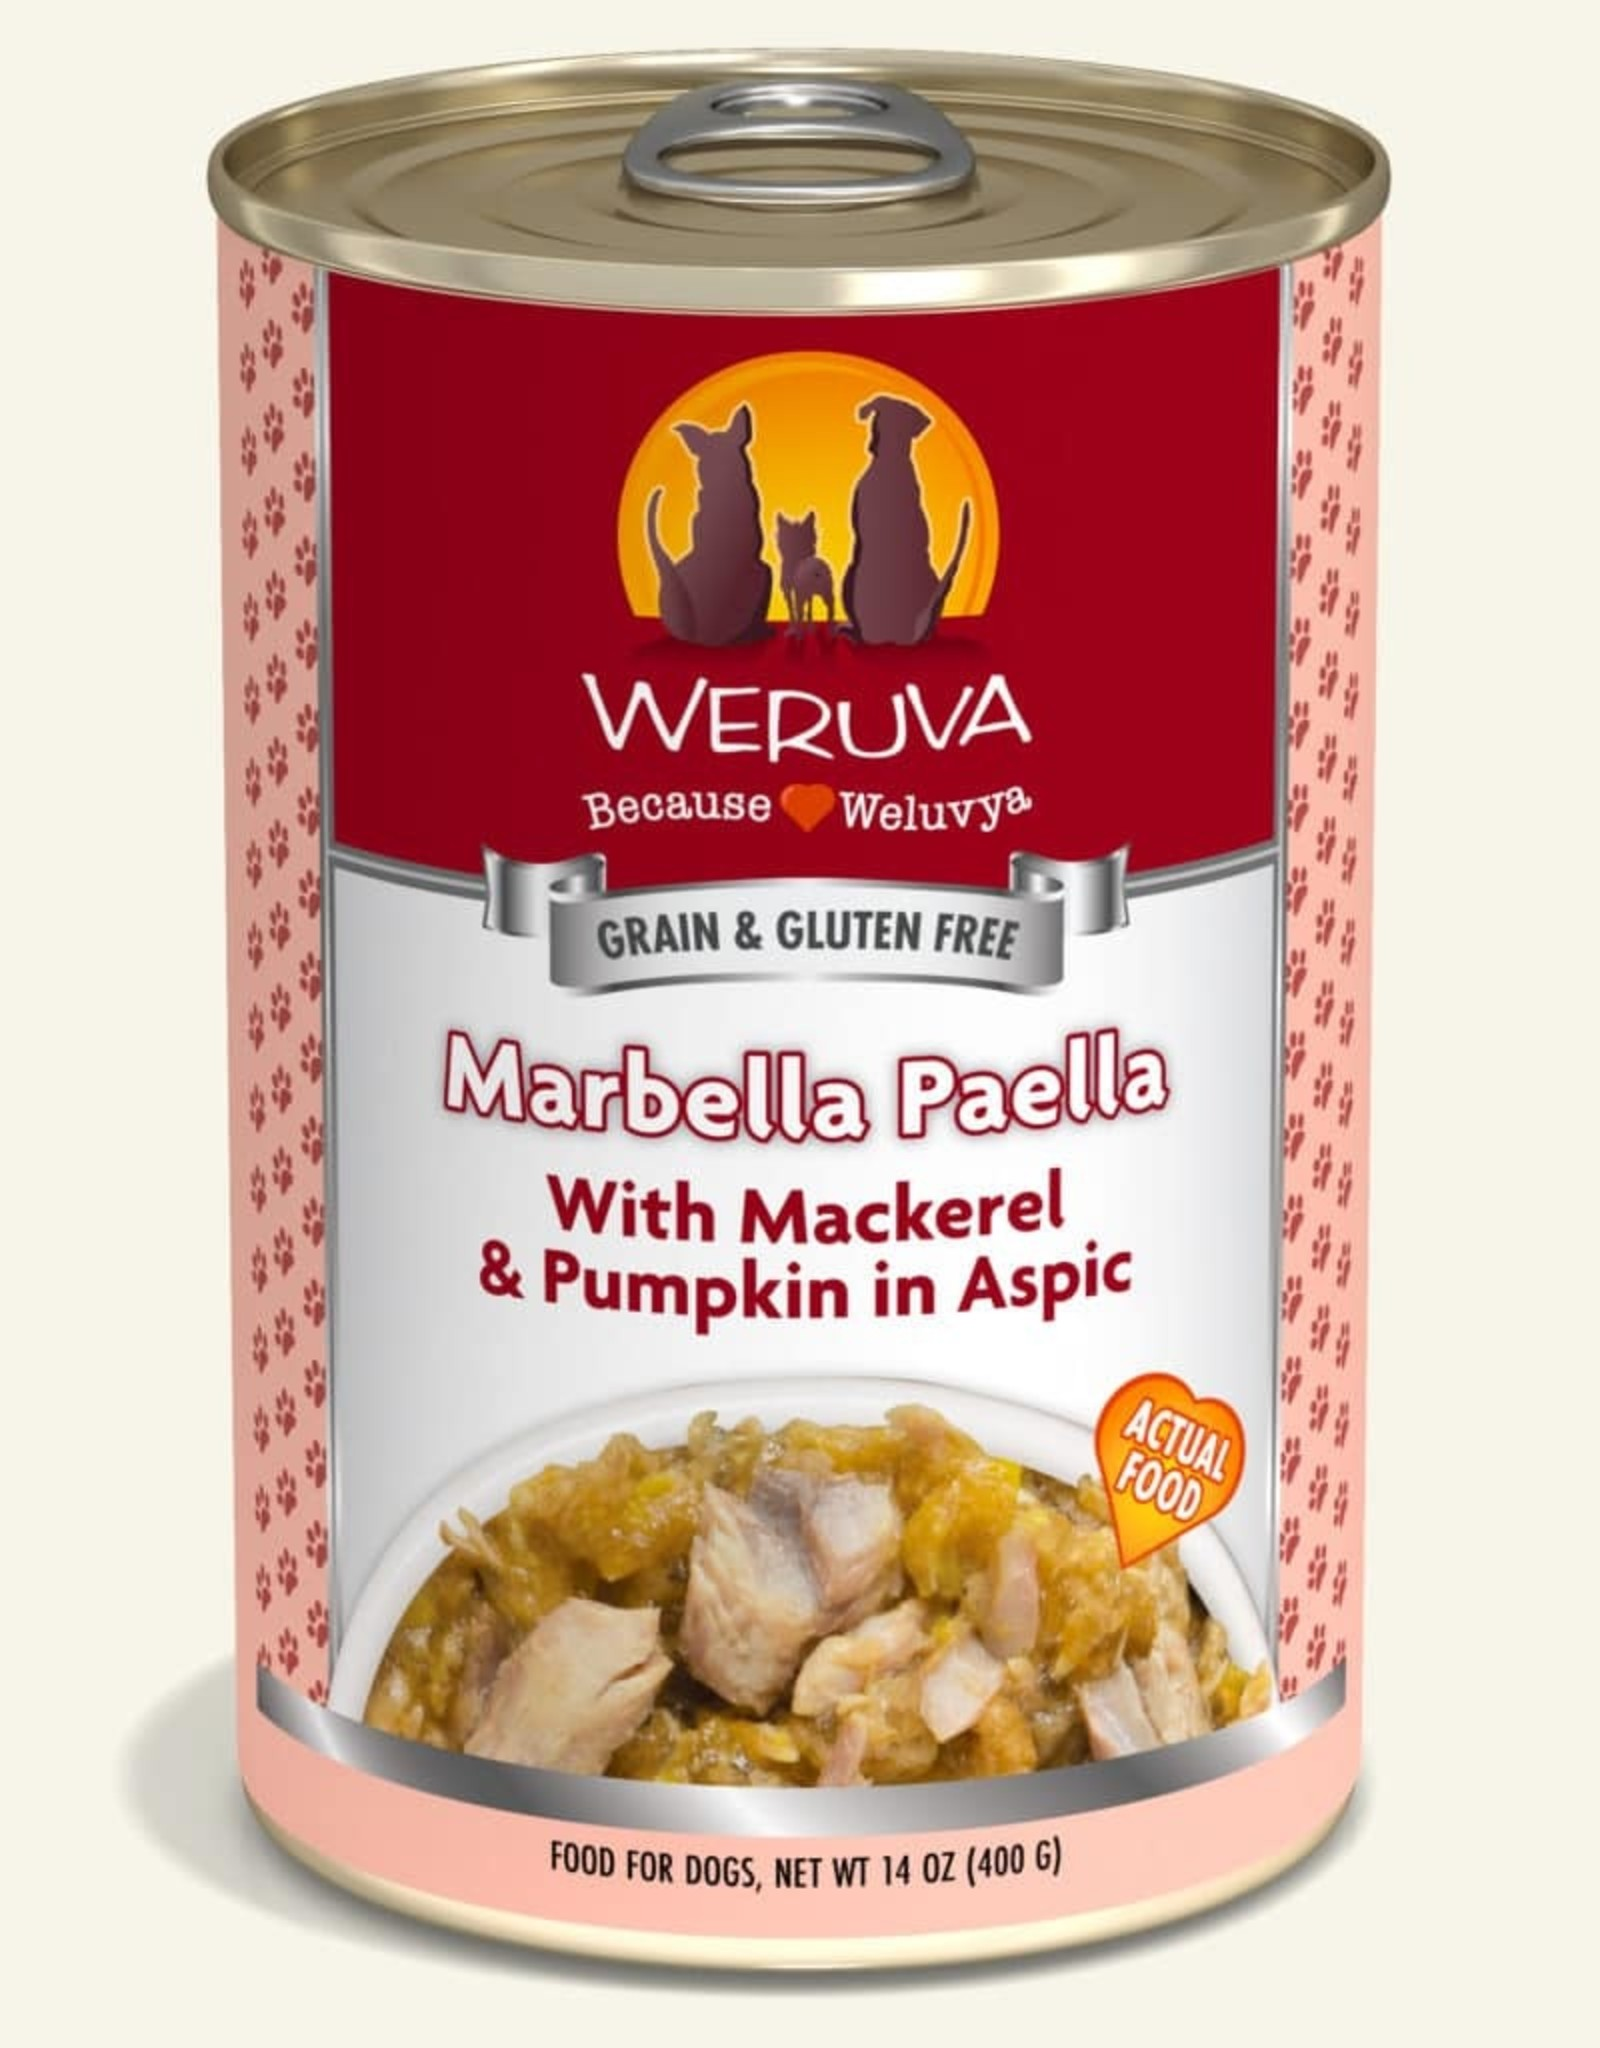 WERUVA Dog Marbella Paella Stew - Grain-Free 14oz